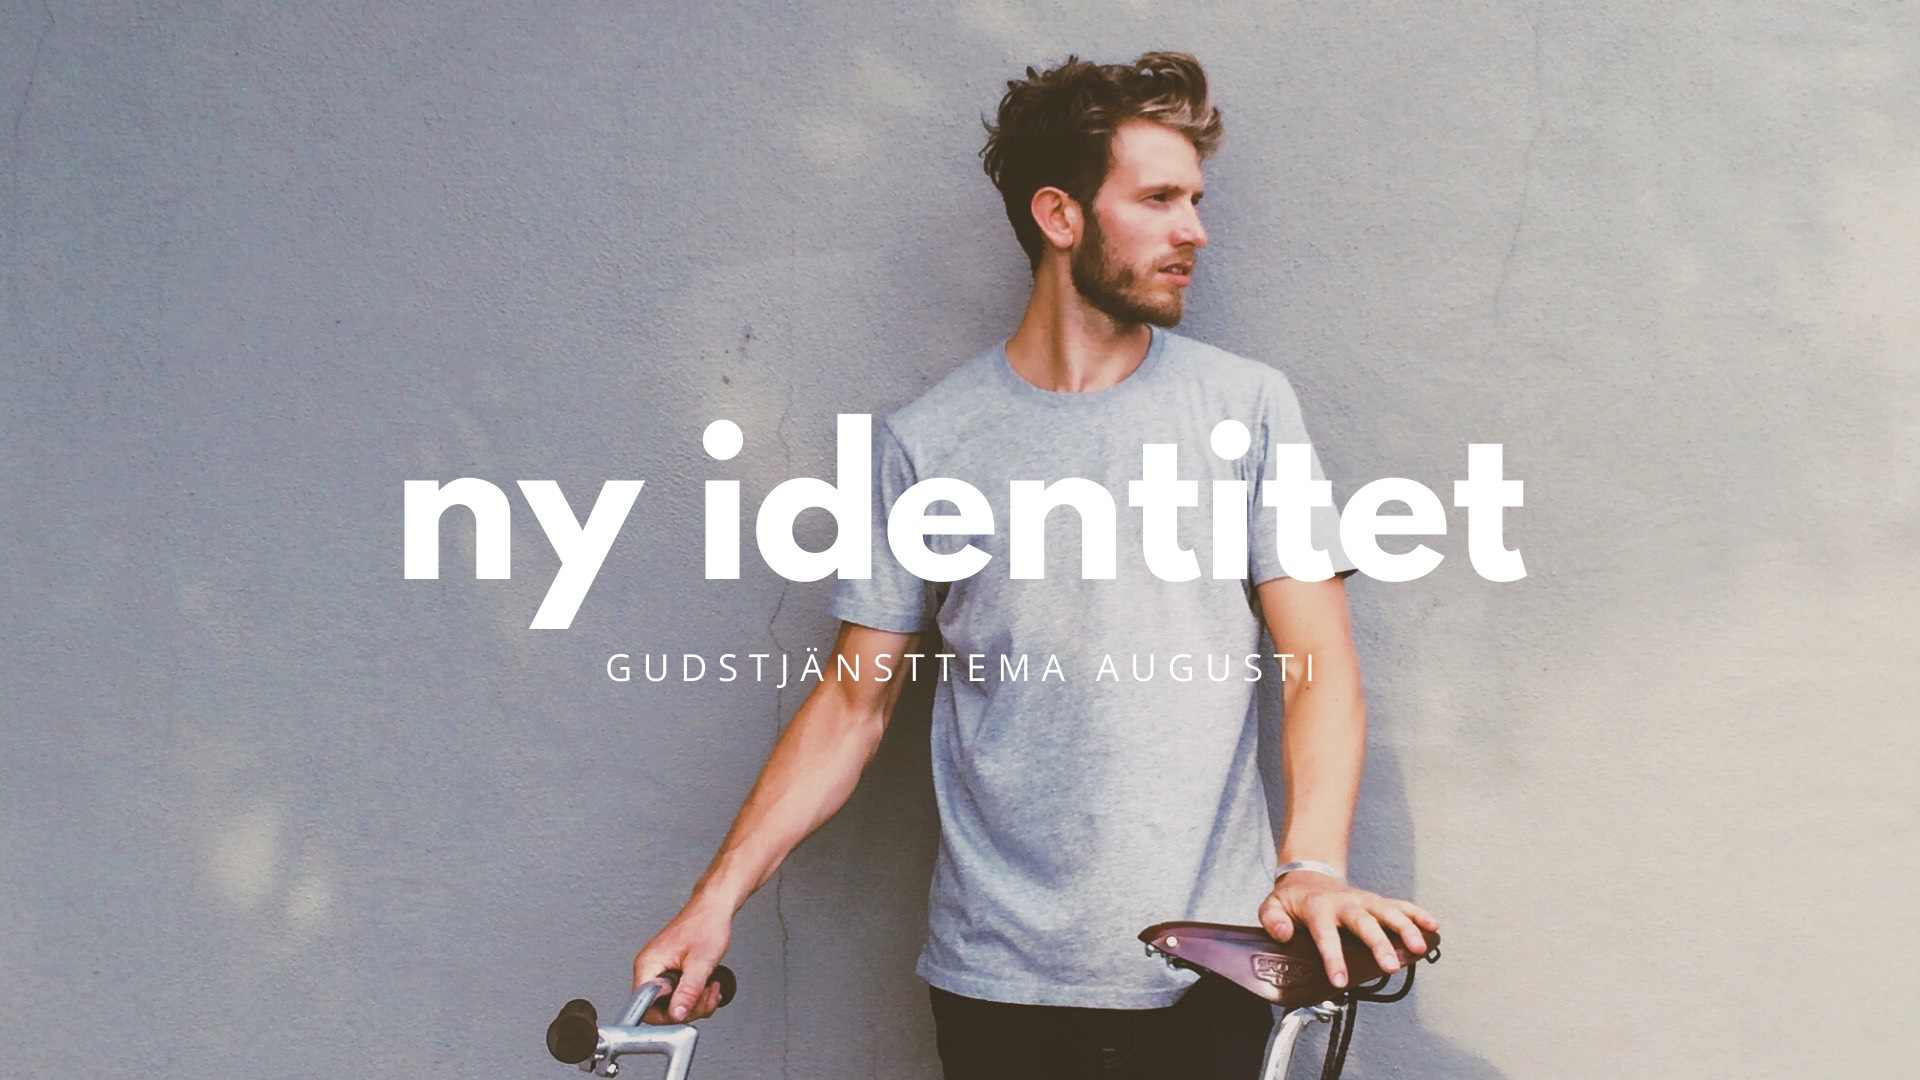 Ny identitet